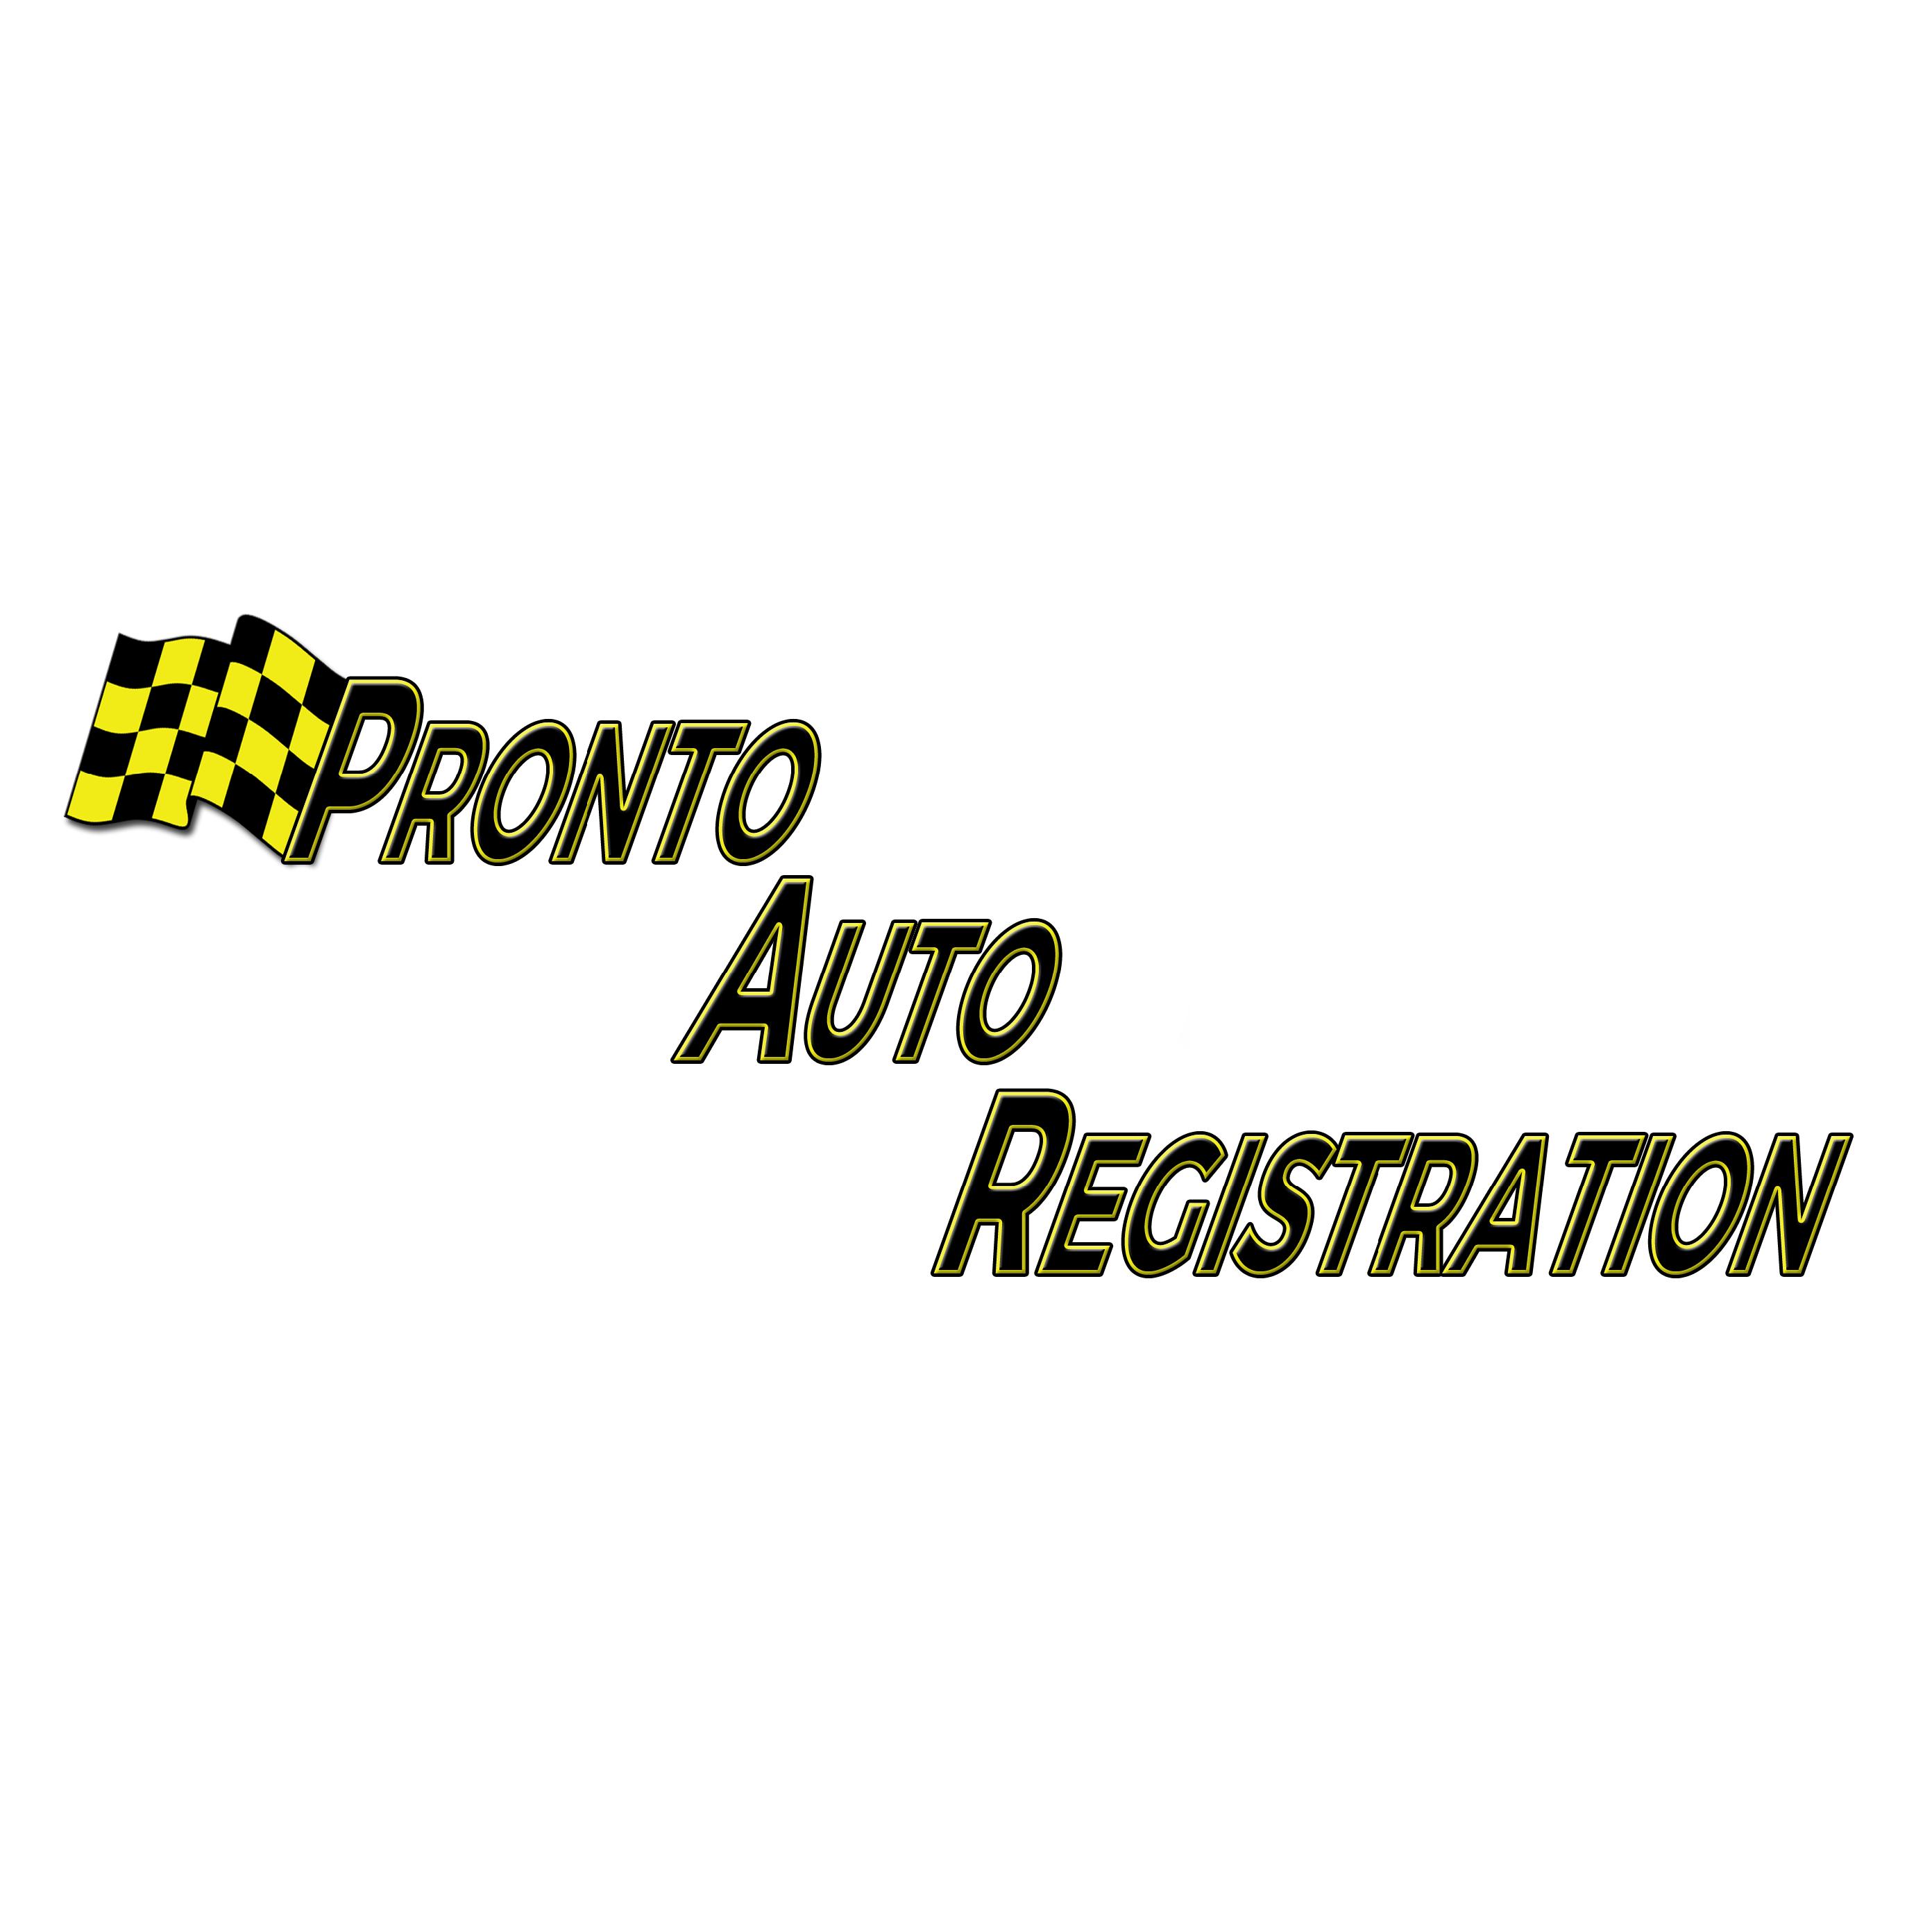 Car Registration California Near Me